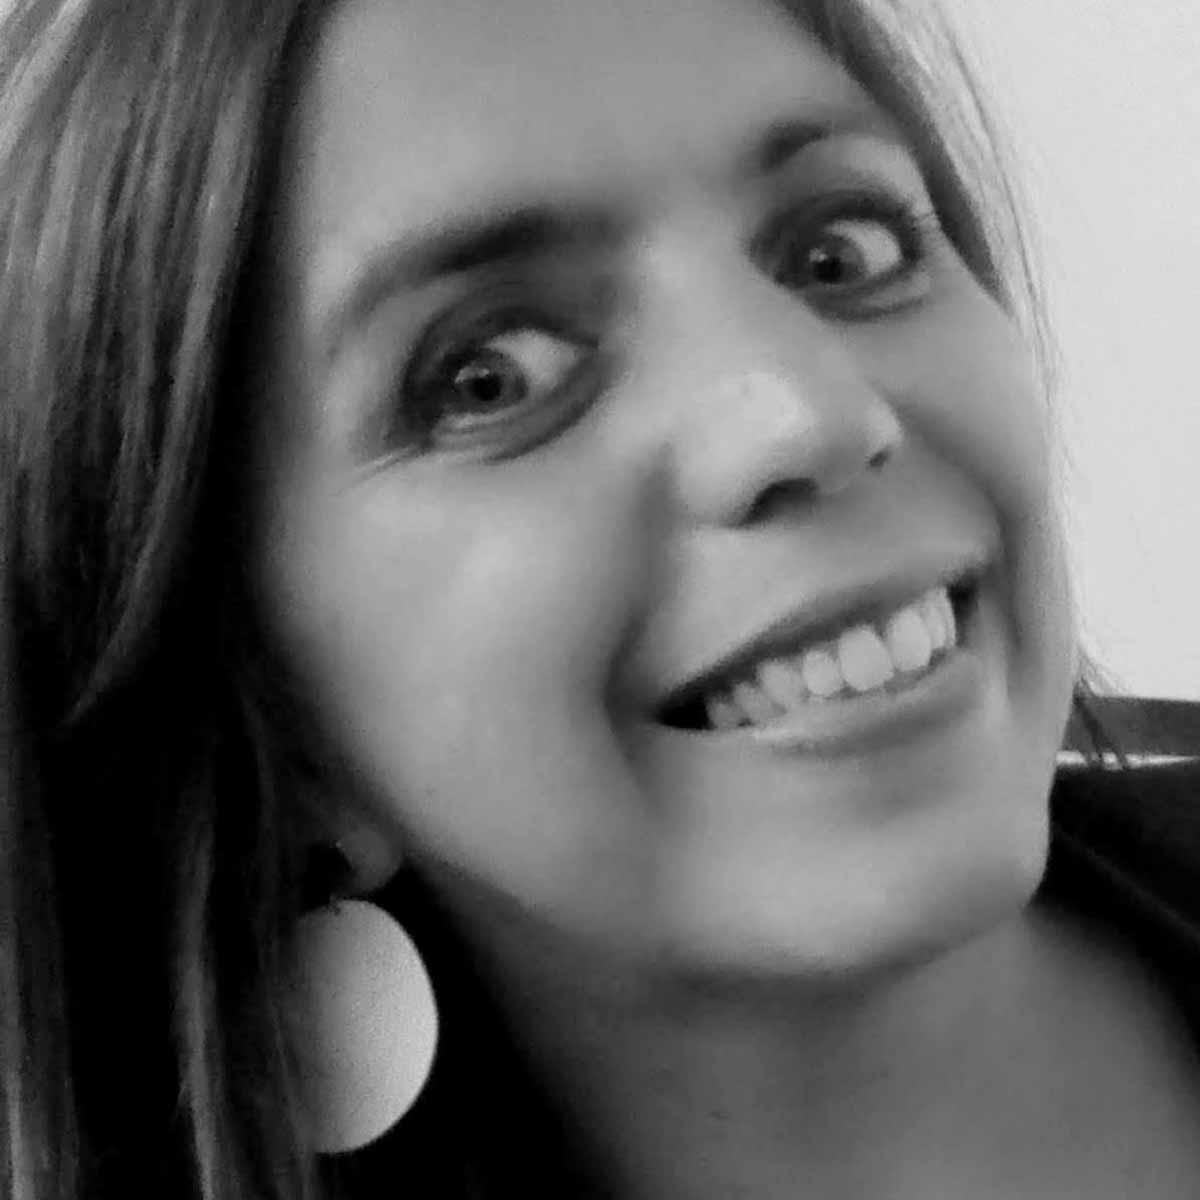 Licenciada Leticia Fernádez